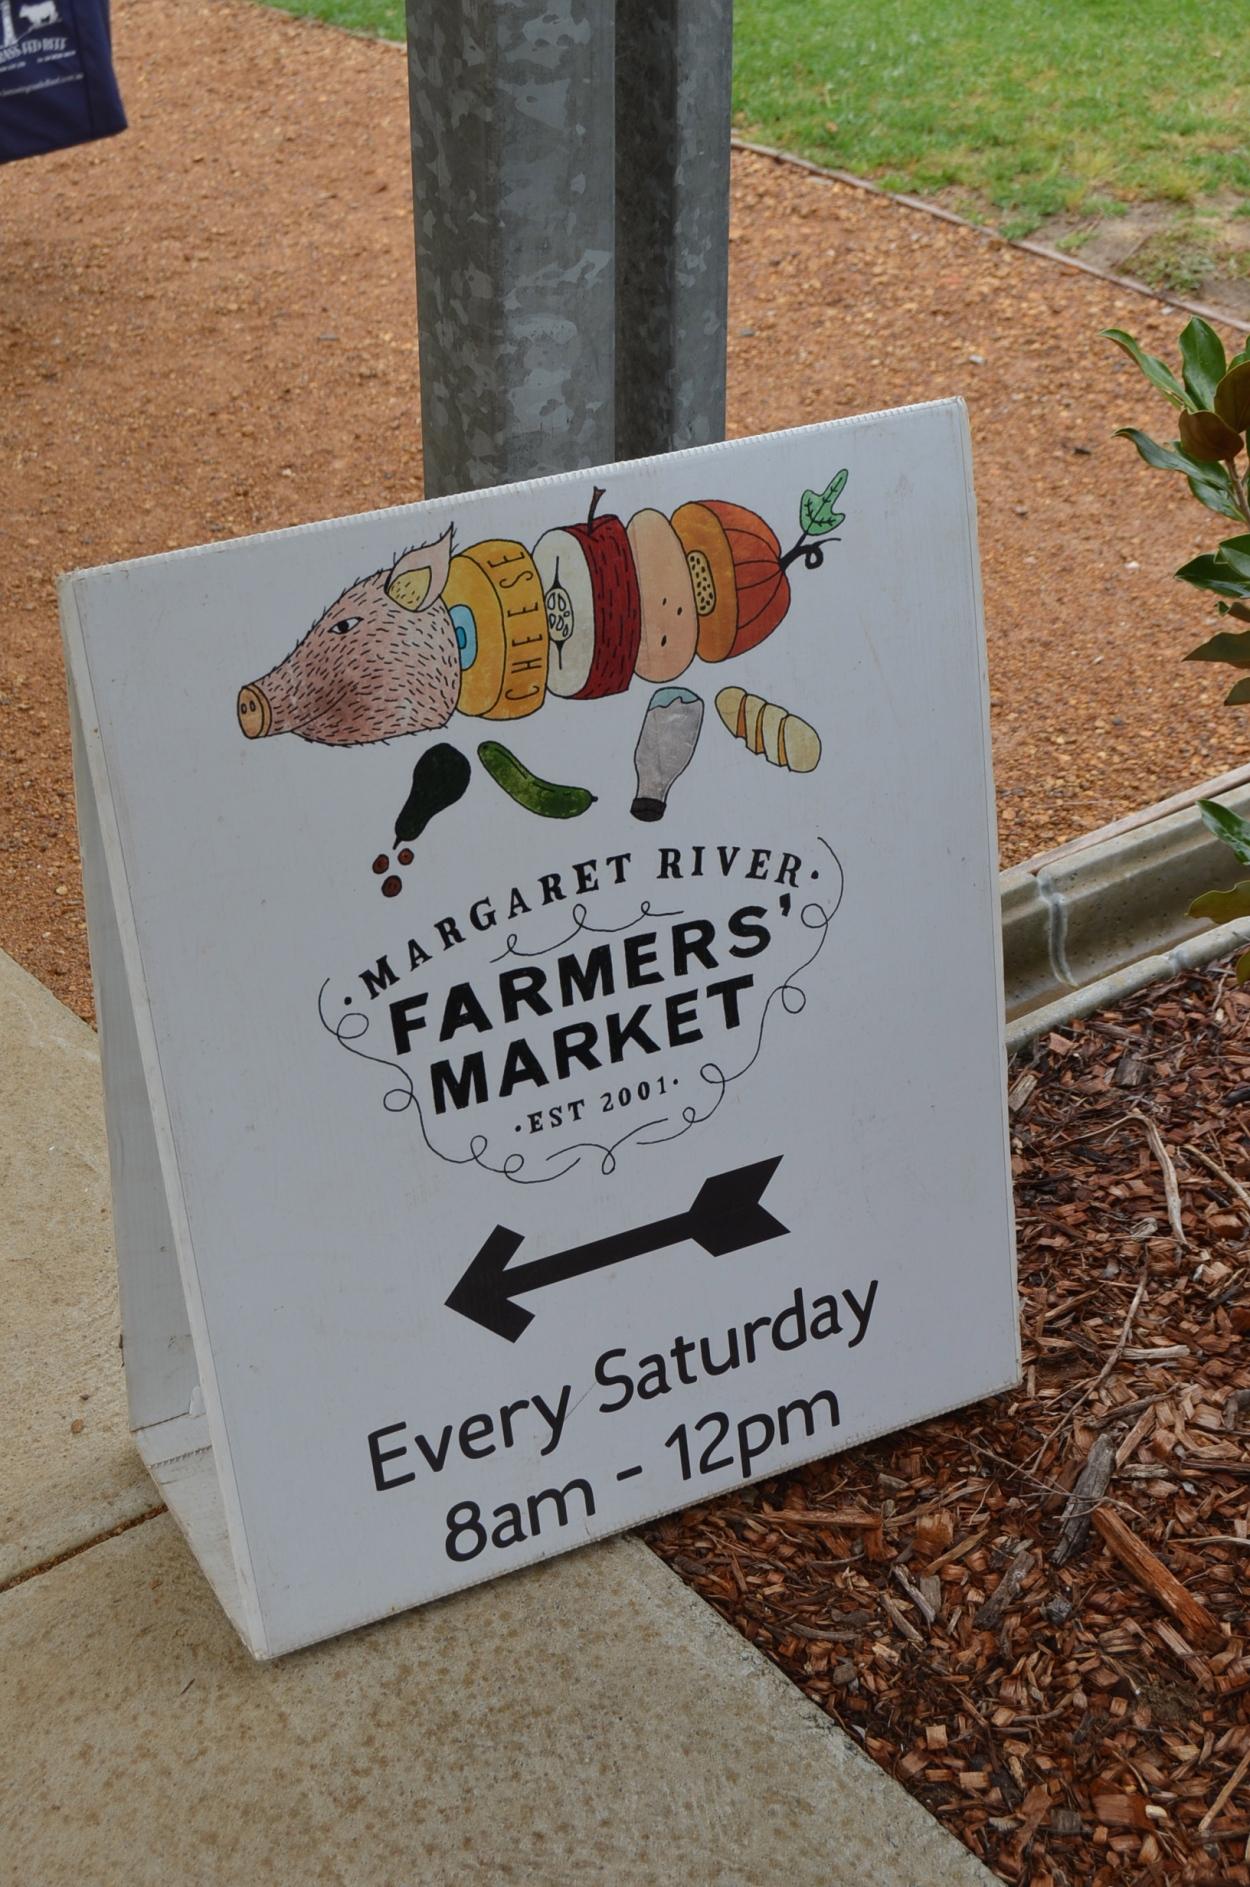 Margaret River Farmers' Market